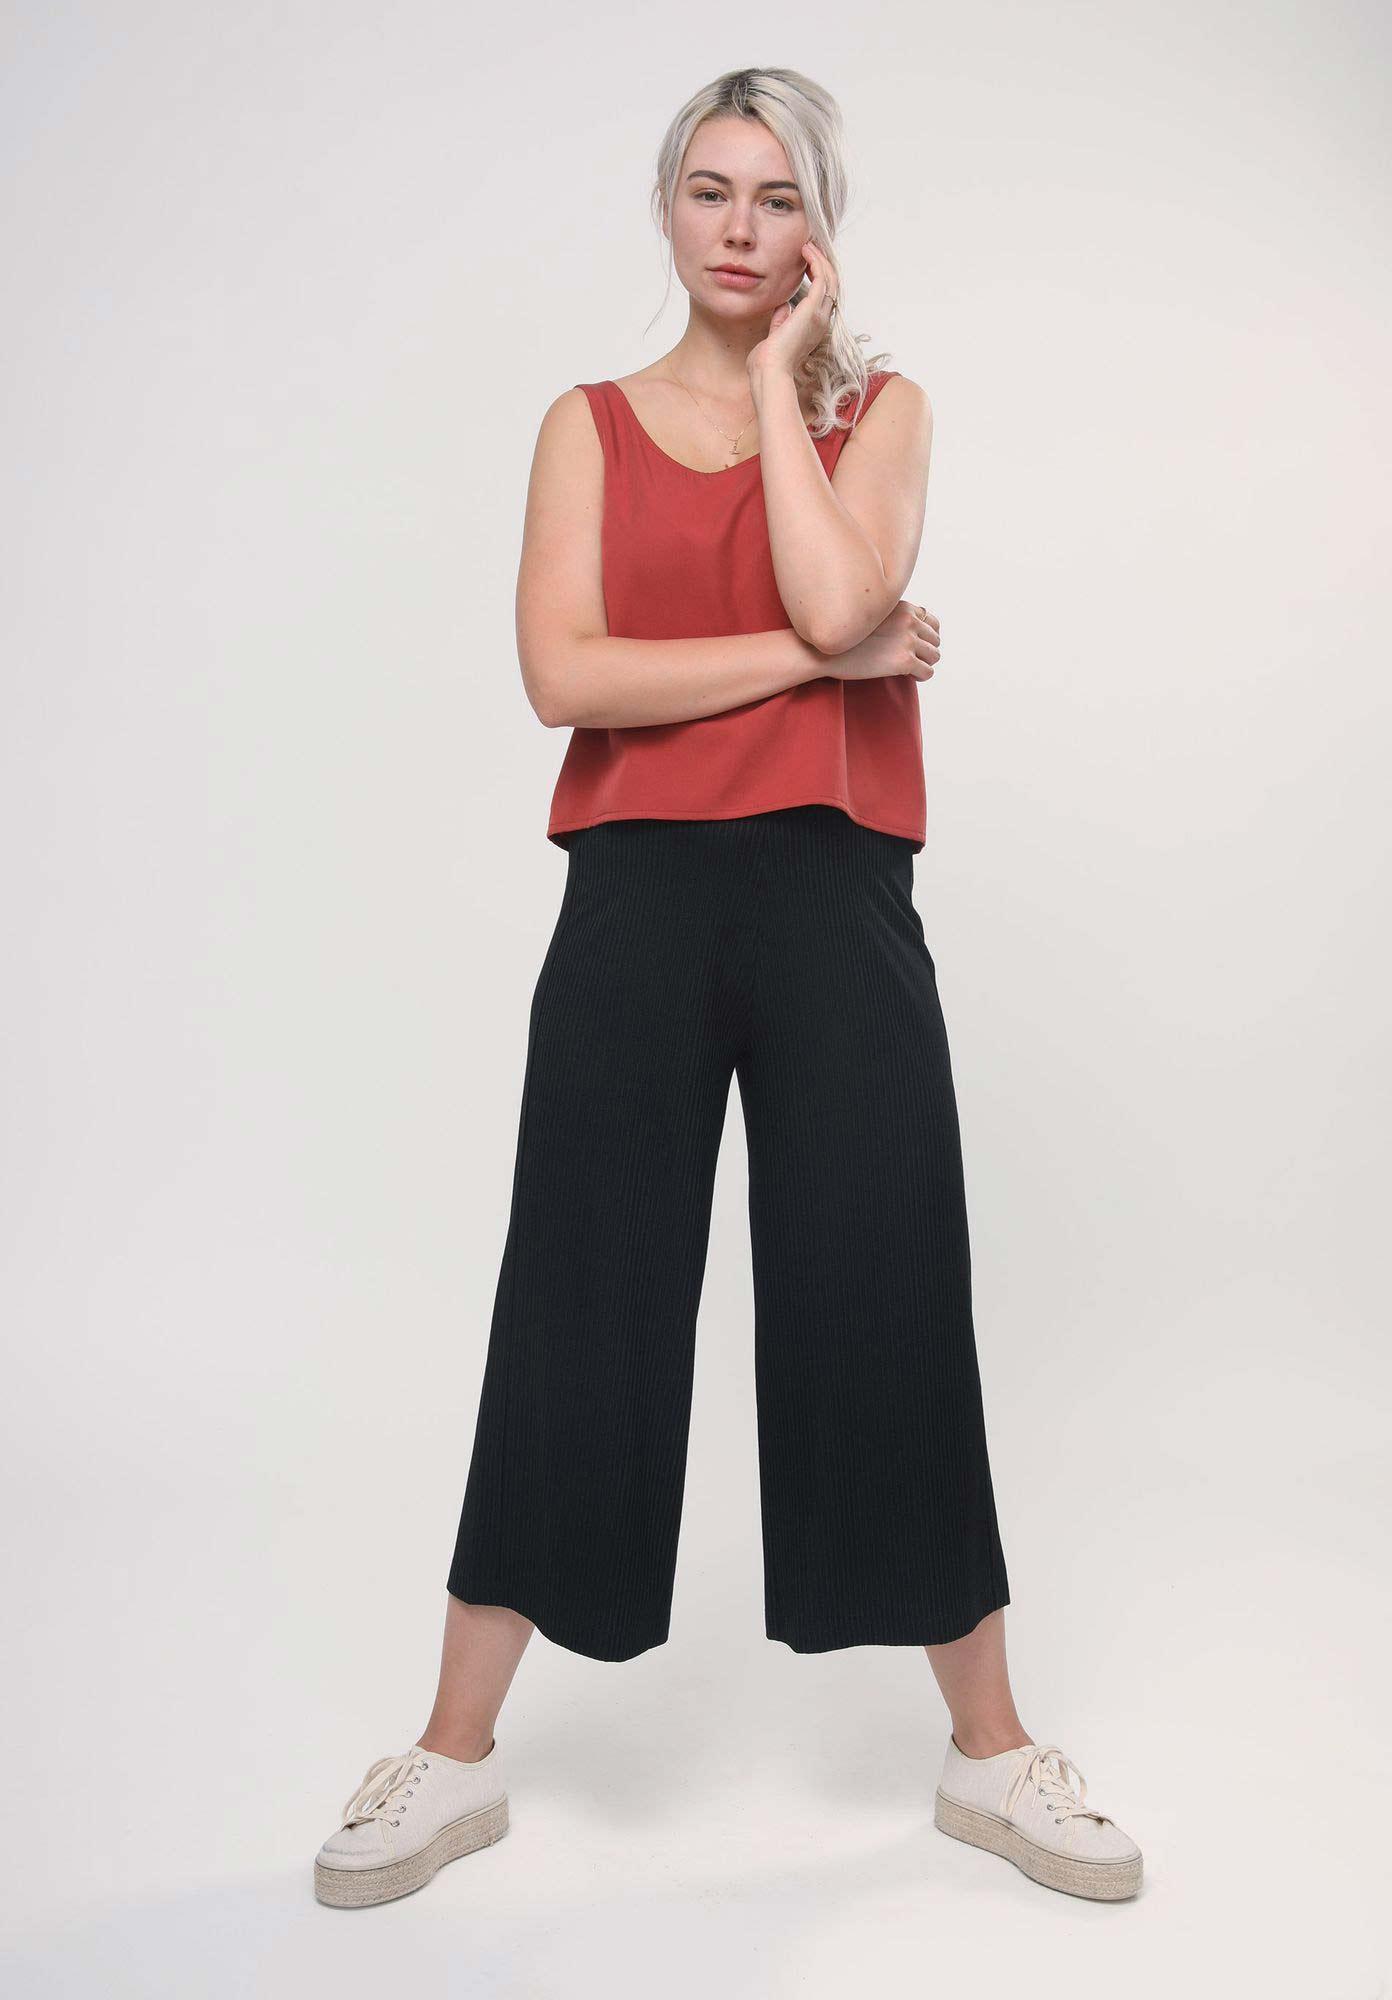 Nachhaltiges Damen LOVJOI Top in rot aus 100% Tencel Lyocellfaser